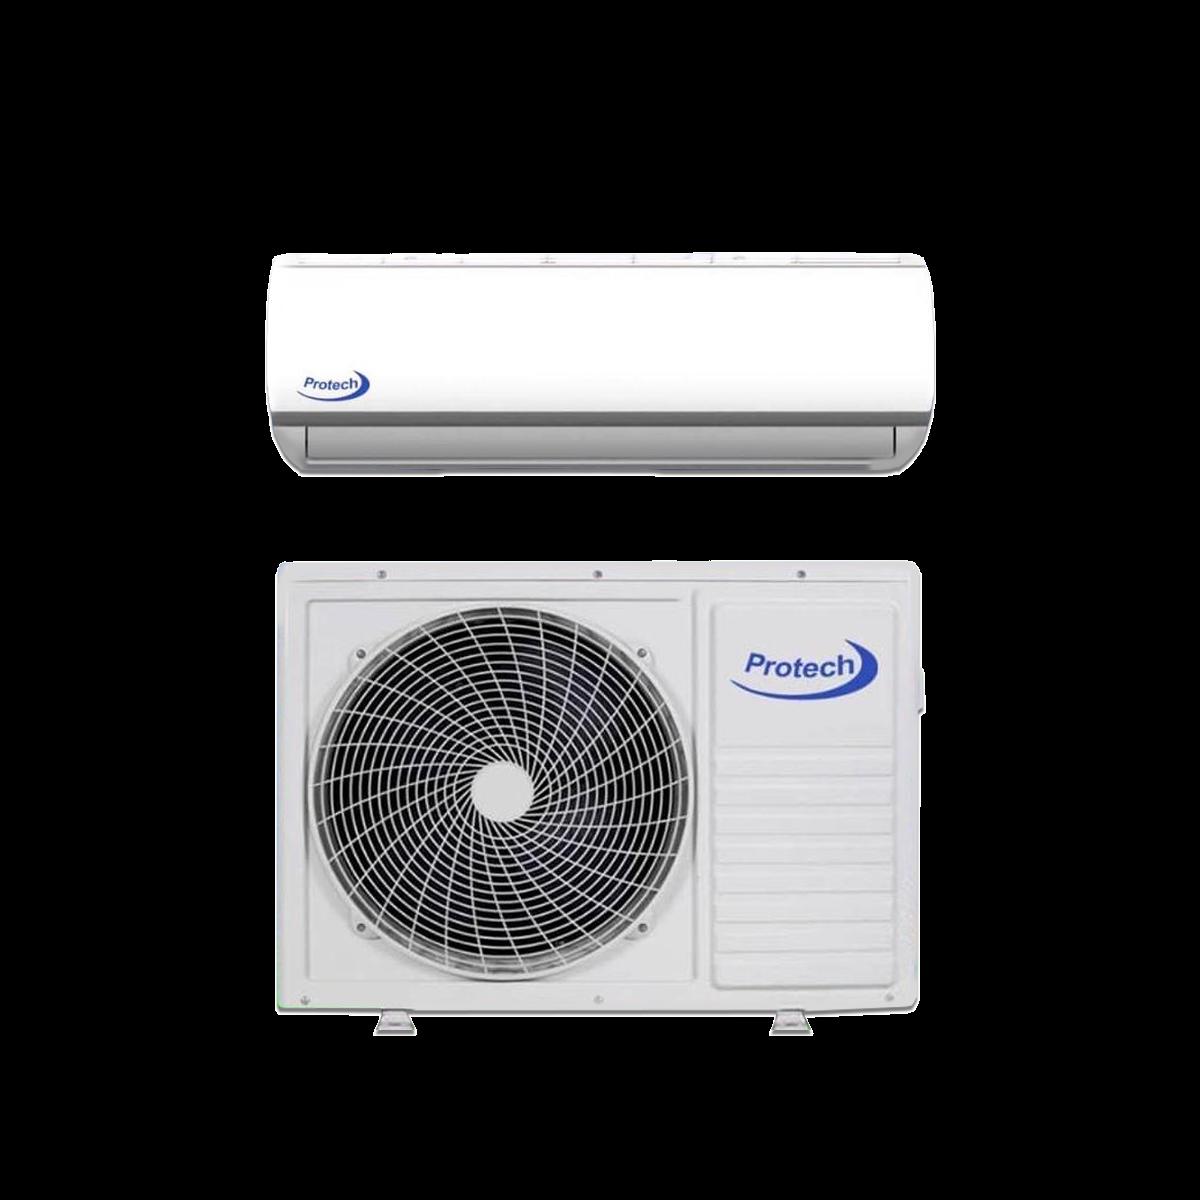 protec_airconditioner 2.0 HP AC